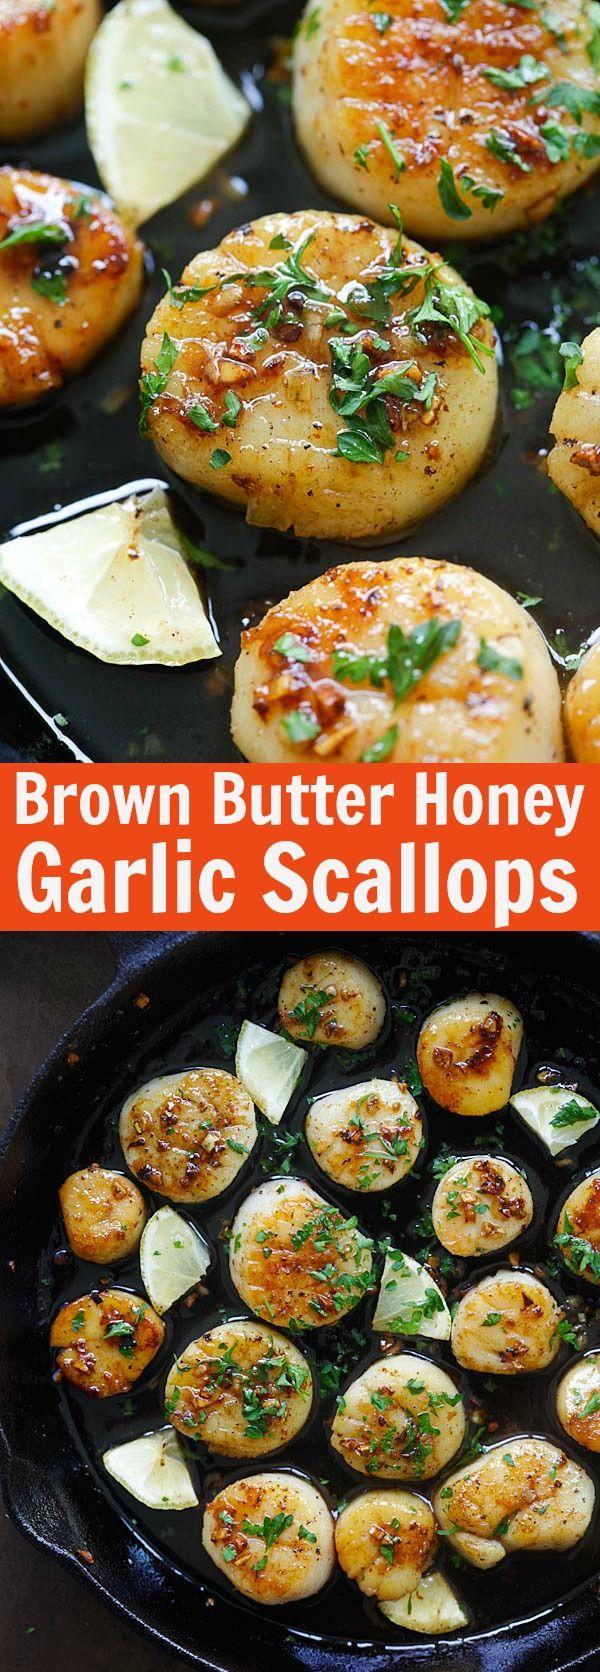 Brown Butter Honey Garlic Scallops – crazy delicious seared scallops with brown butter and honey garlic sauce. The best scallops recipe ever   rasamalaysia.com